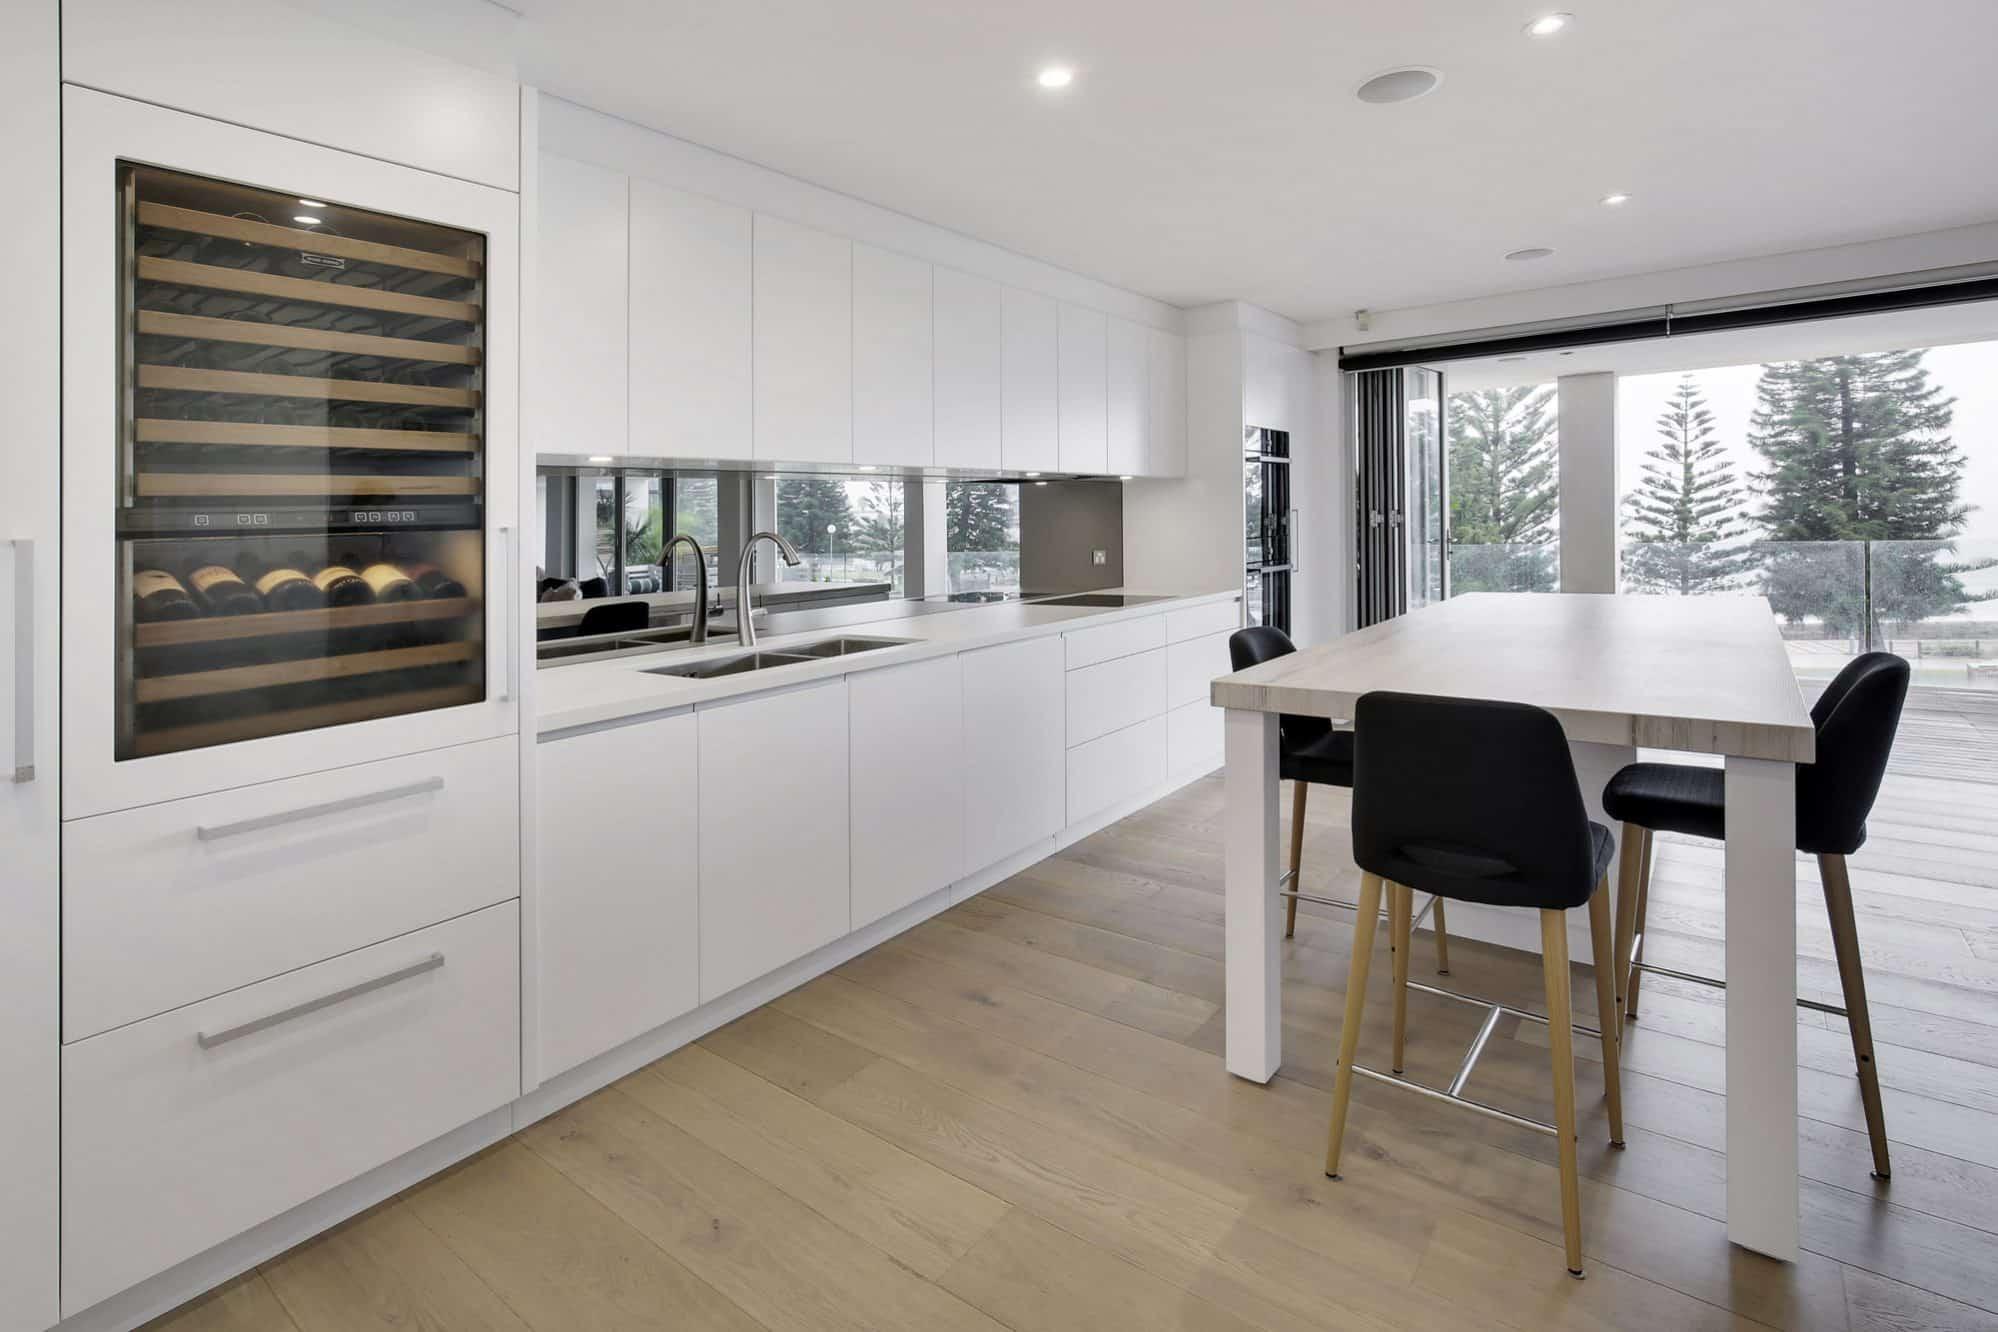 Coogee Beach Apartment Kitchen 004